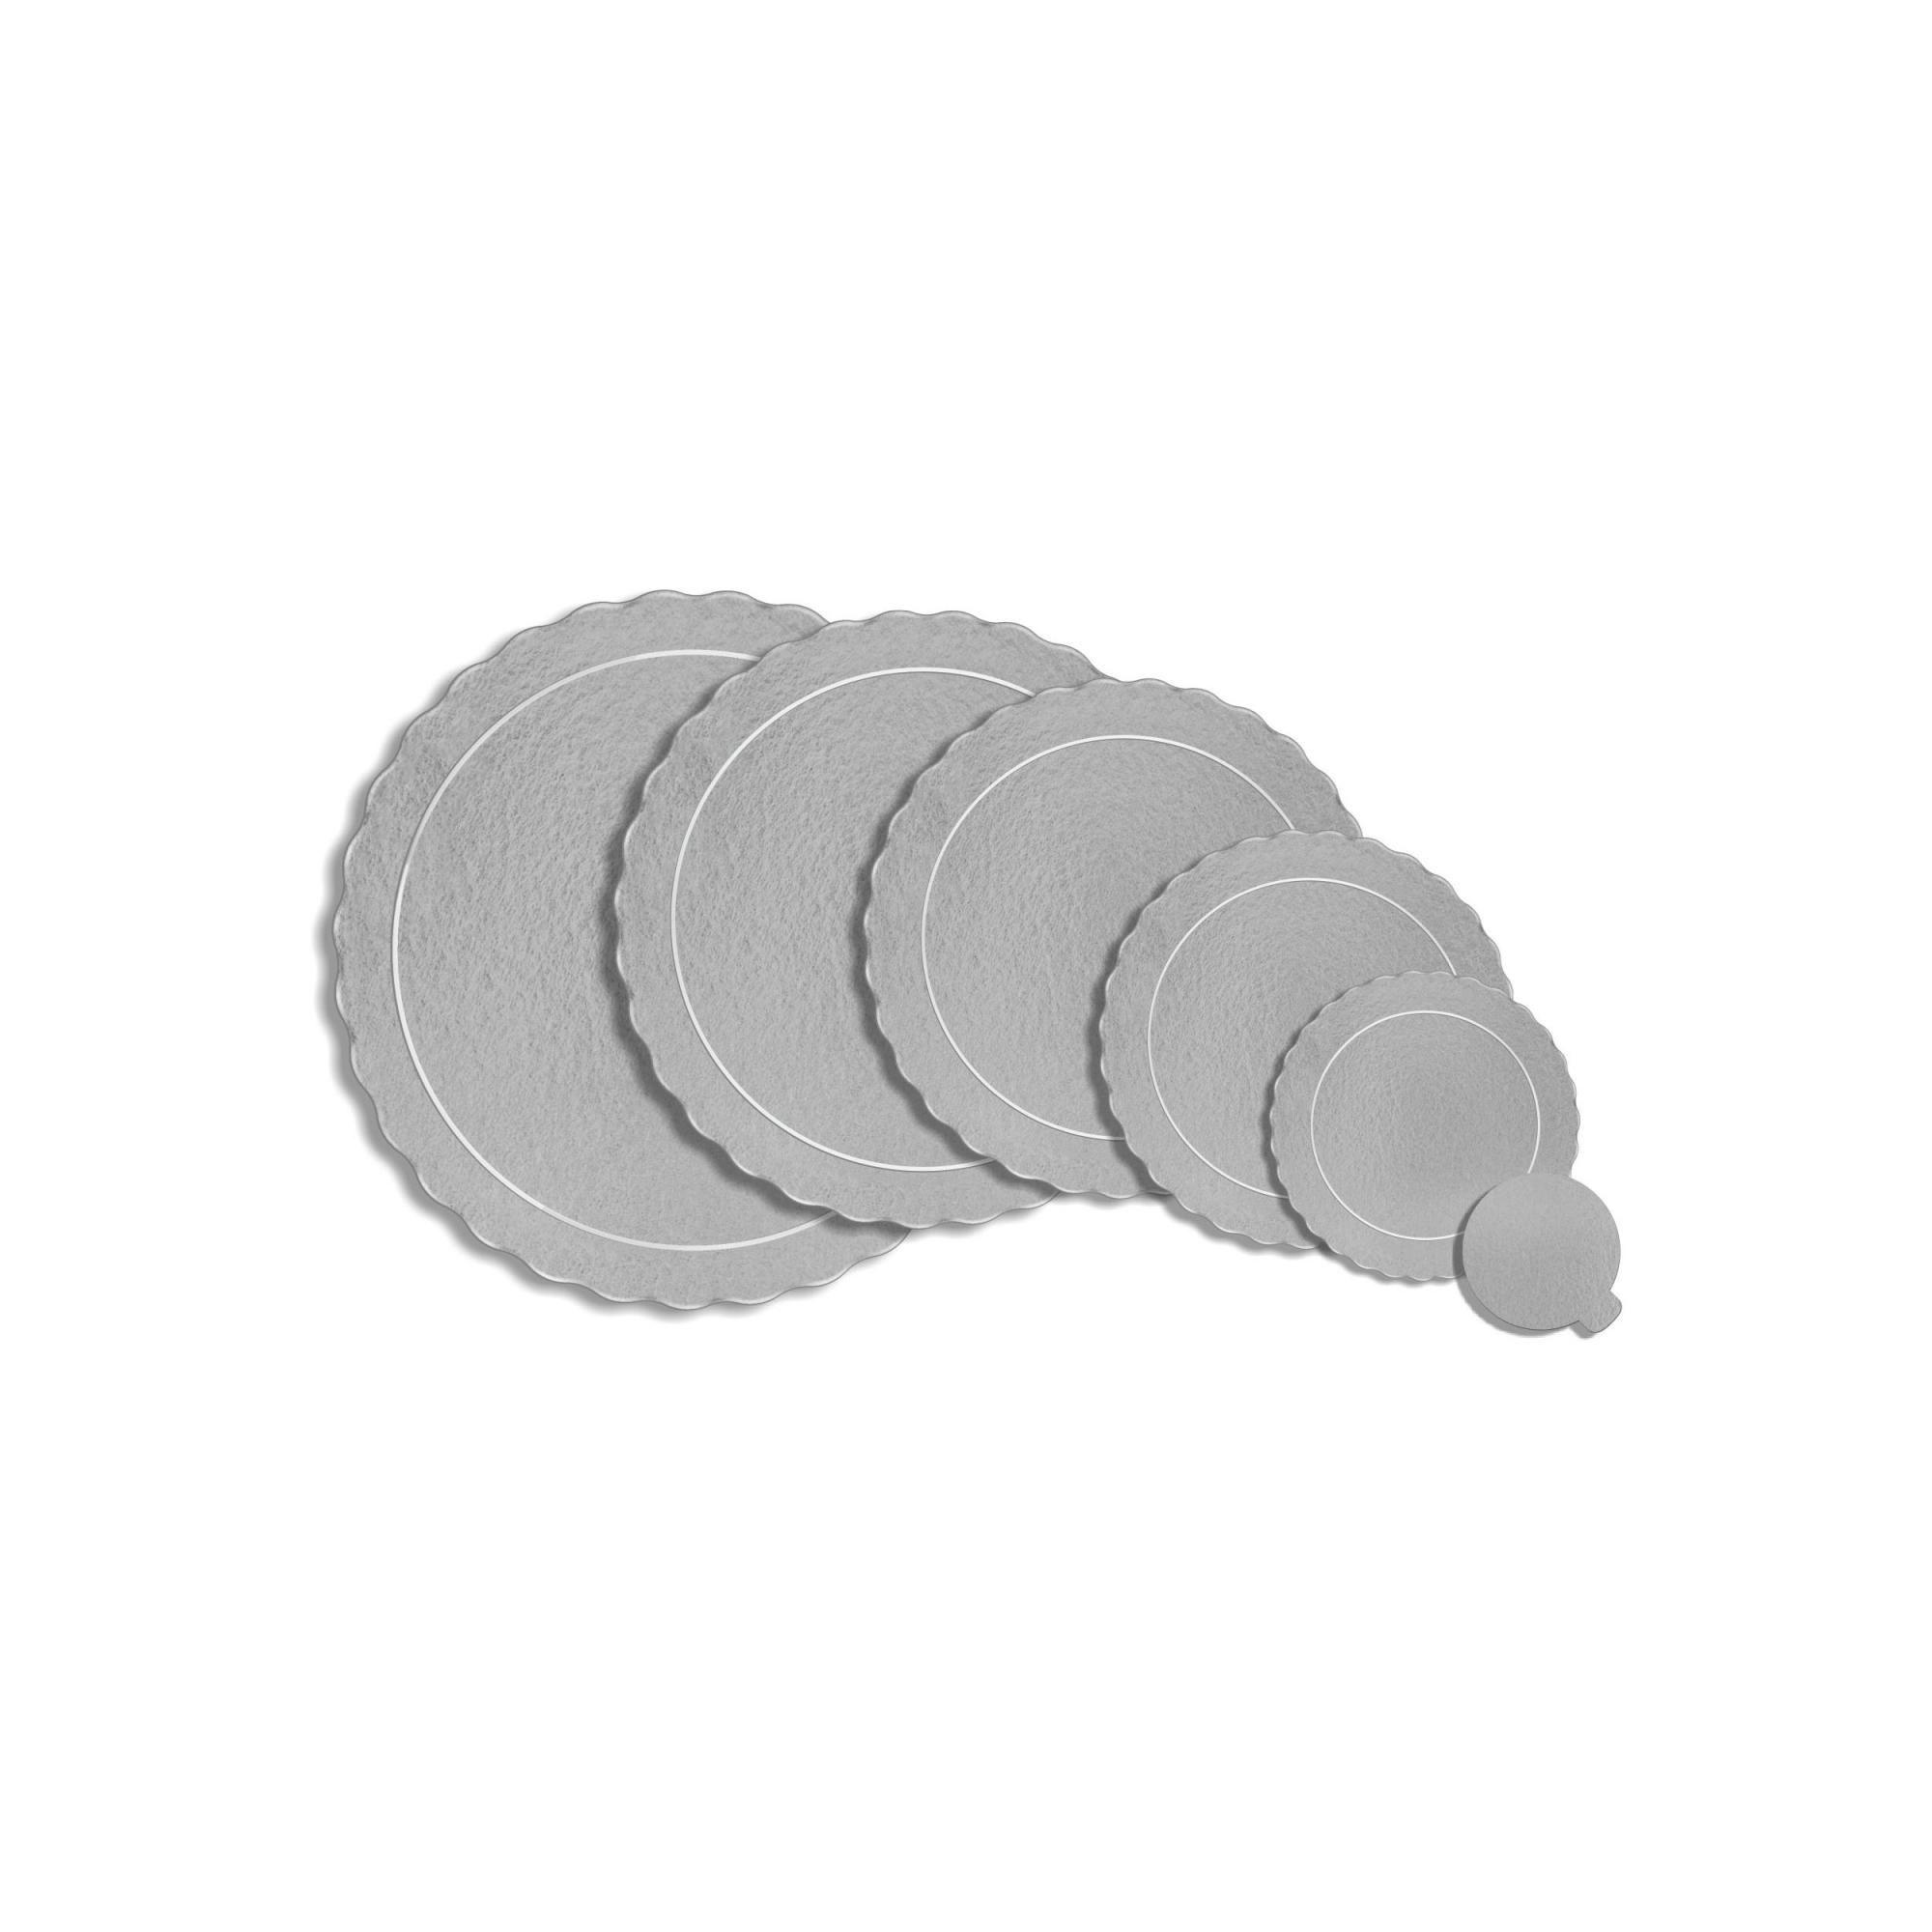 100 Bases Laminadas, Suporte P/ Bolo, Cake Board, Kit 24 e 28 cm - Prata